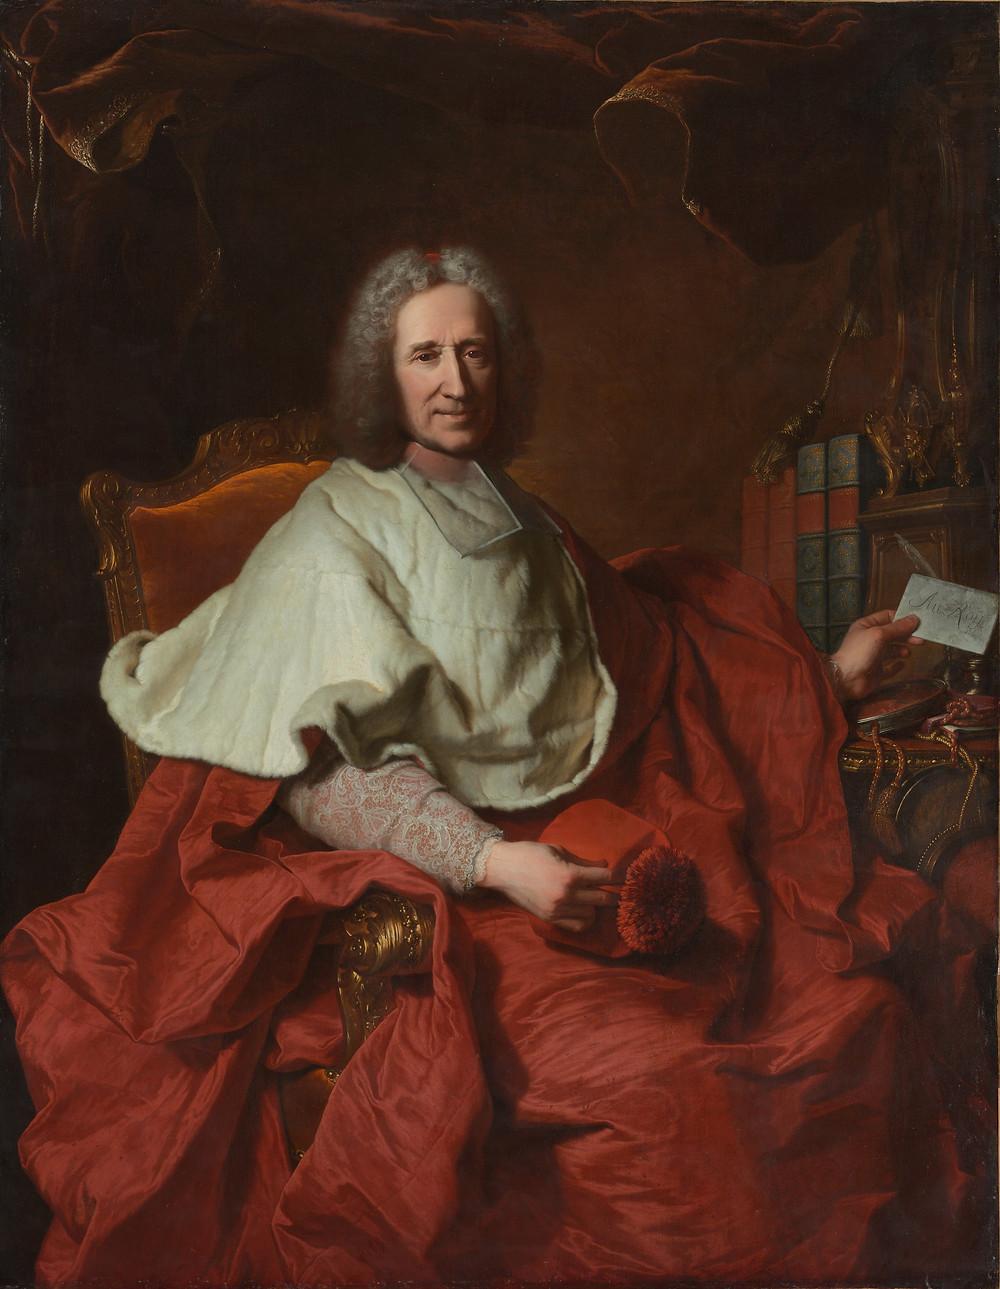 Hyacinthe Rigaud, Portrait du cardinal Dubois, 1723, Etats-Unis, Cleveland, Museum of Art, inv. CMA.67.17.